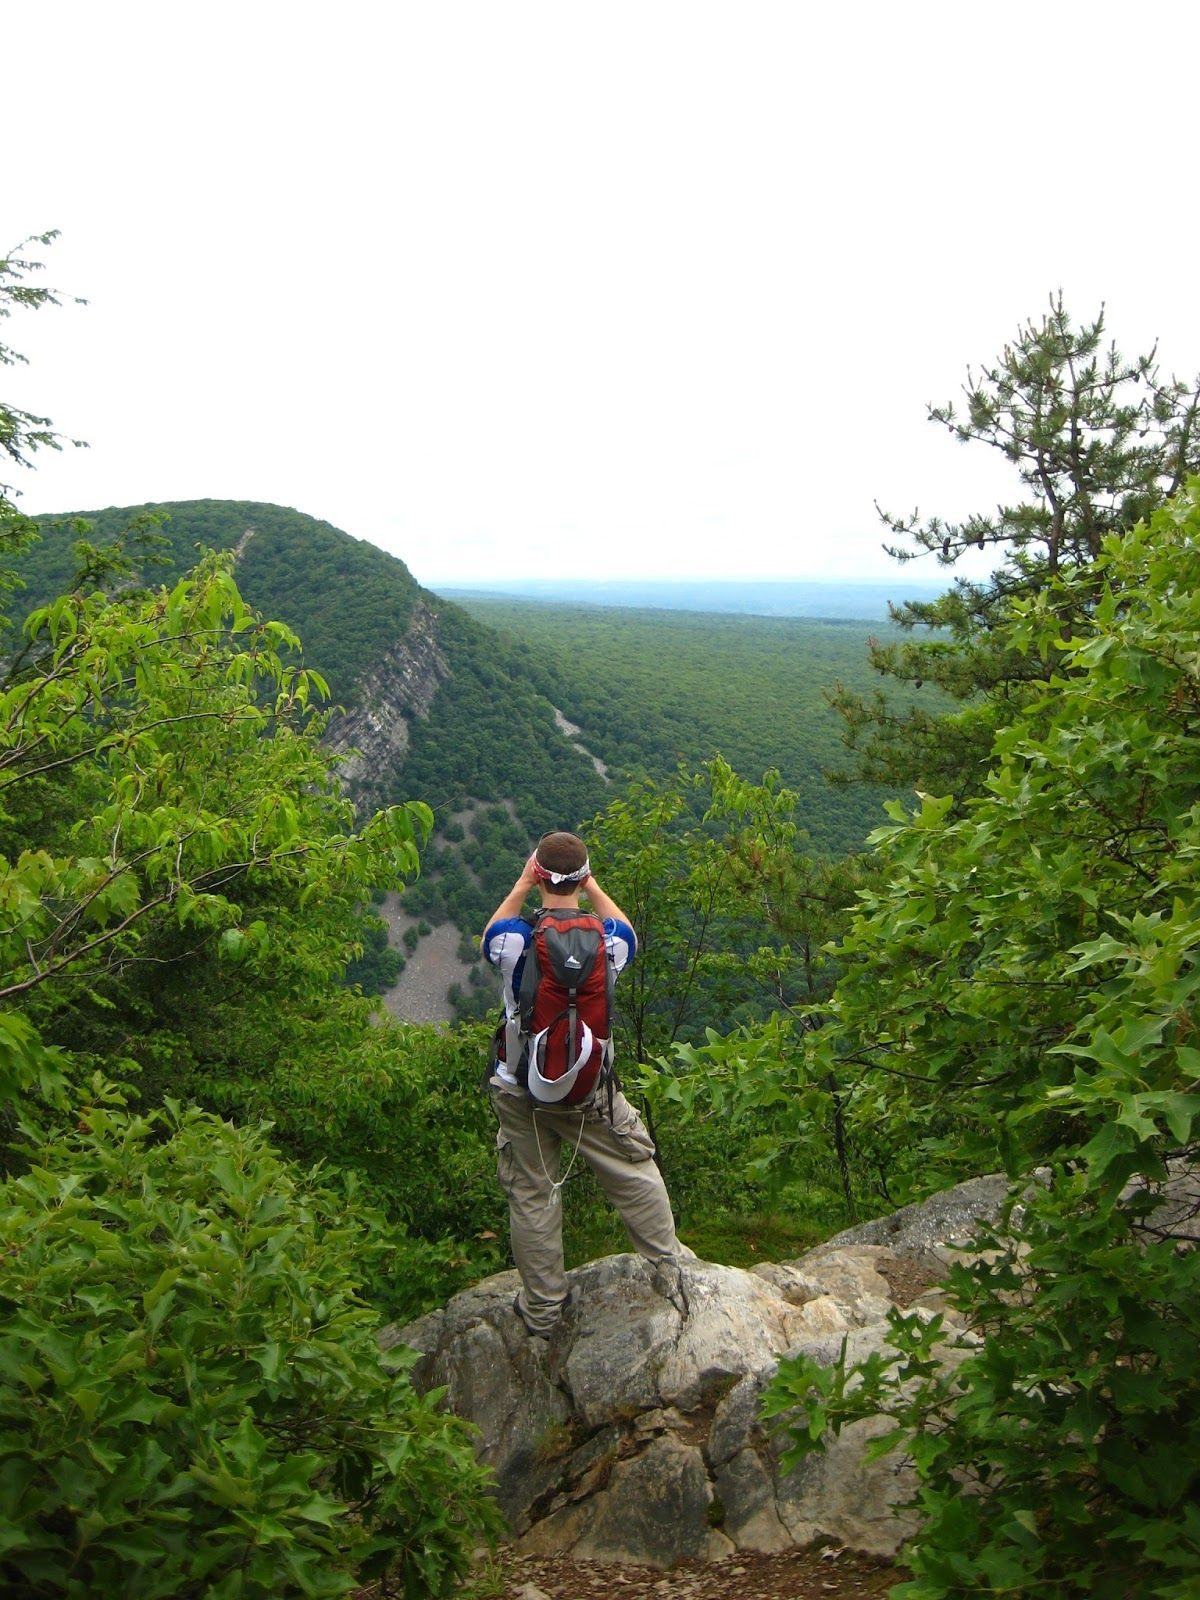 d99857e36 adventure-inspired  Hiking Pennsylvania  Mount Minsi in the Delaware ...